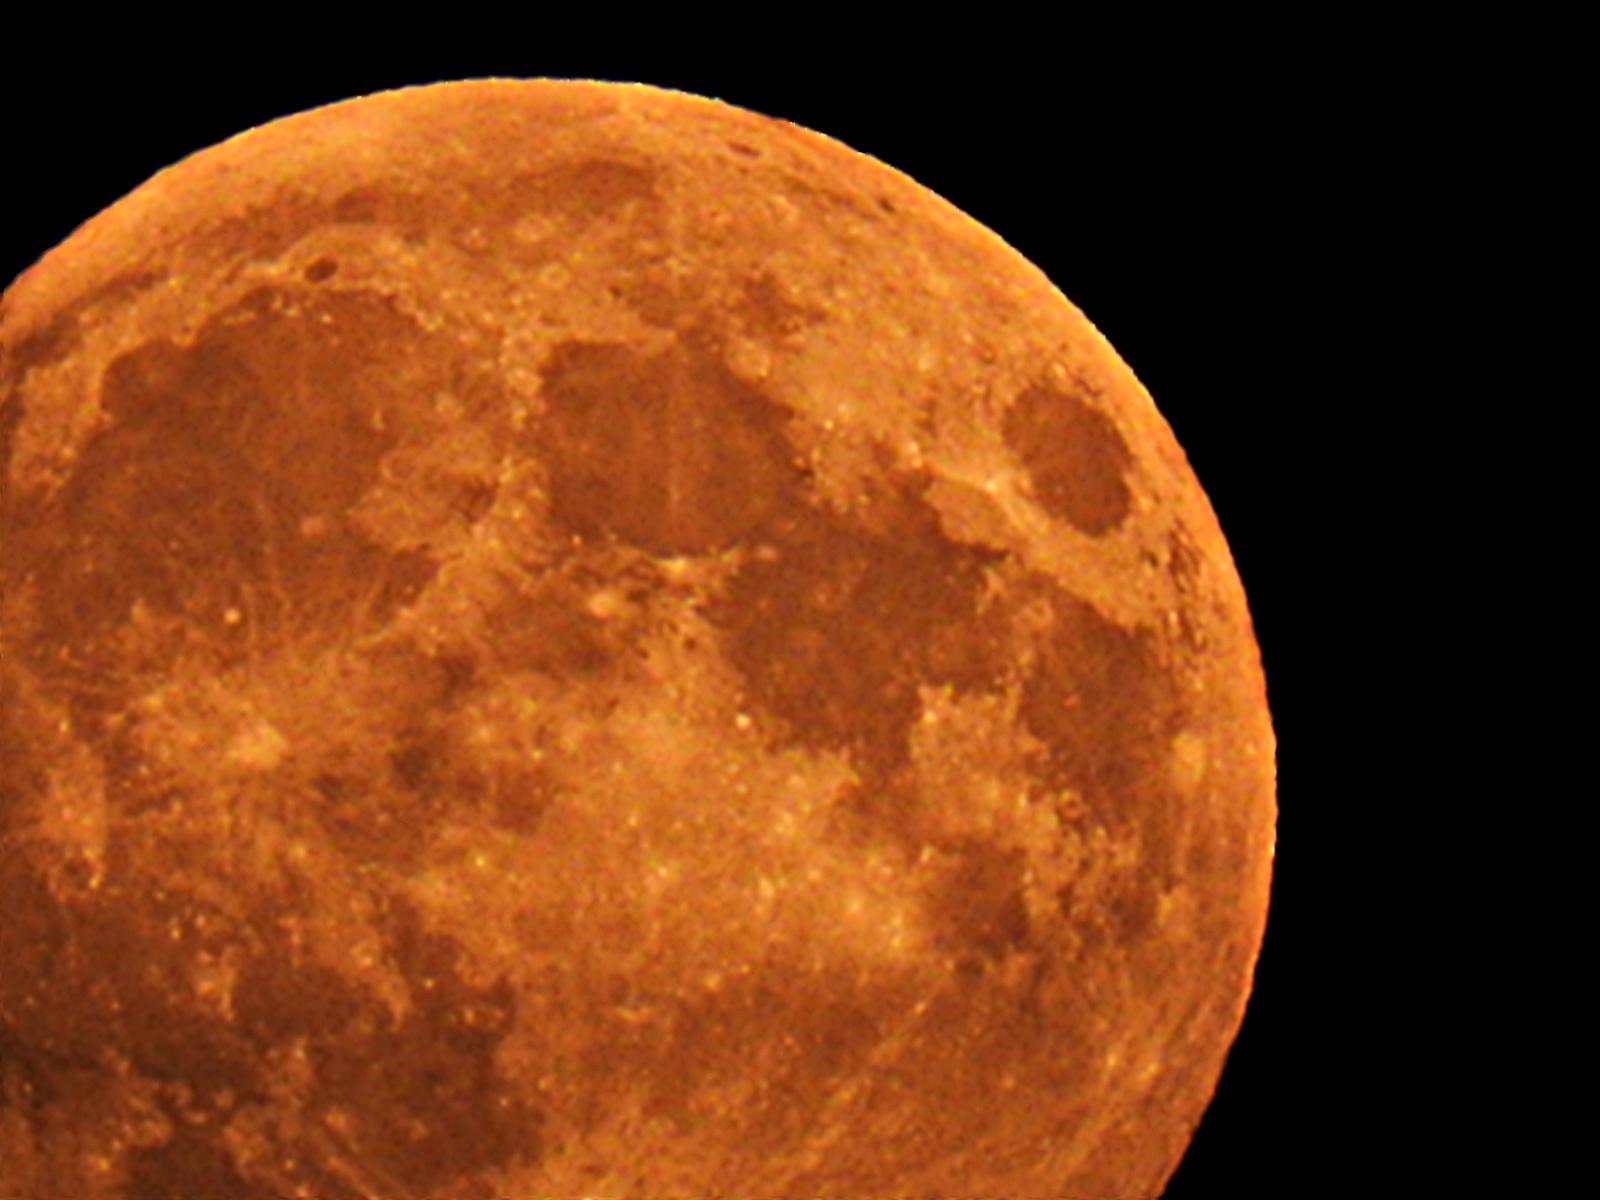 Felkelt a szuper Hold nagyban 2015.09.27.